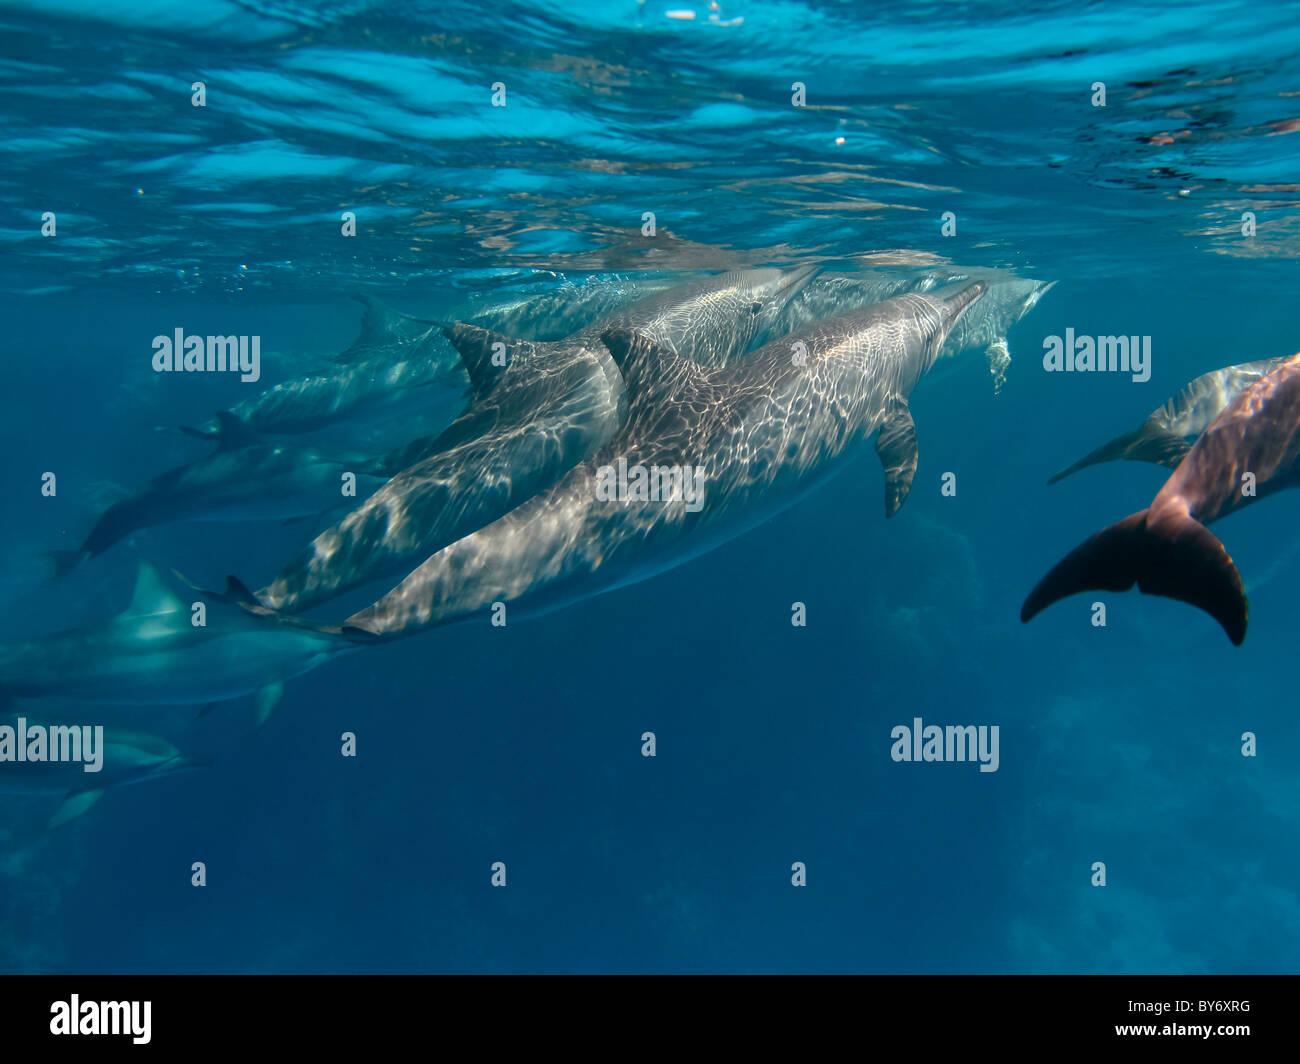 Spinner Dolphins, Stenella longirostris, Spinnerdelfine, milling at Shaab Marsa Alam, Egypt, underwater group - Stock Image